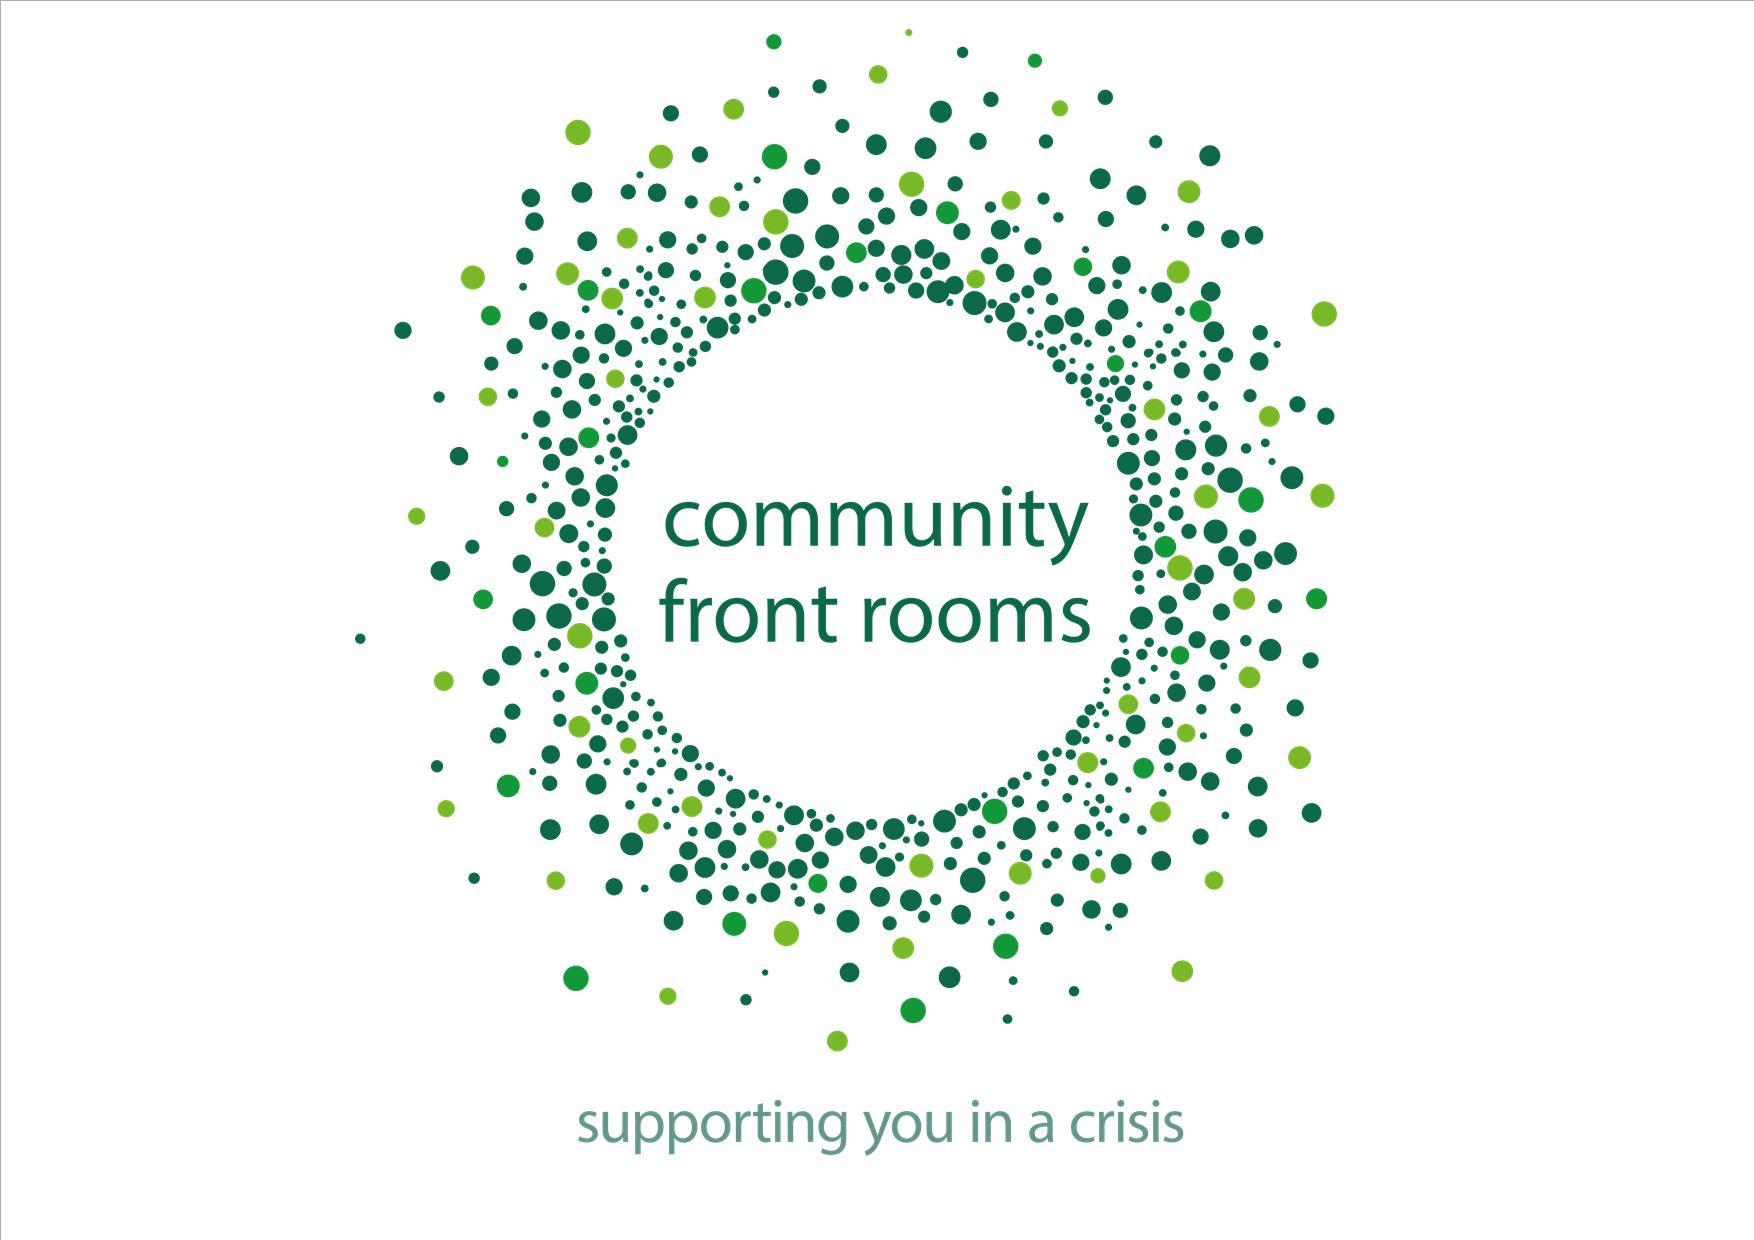 Community front rooms jpeg logo